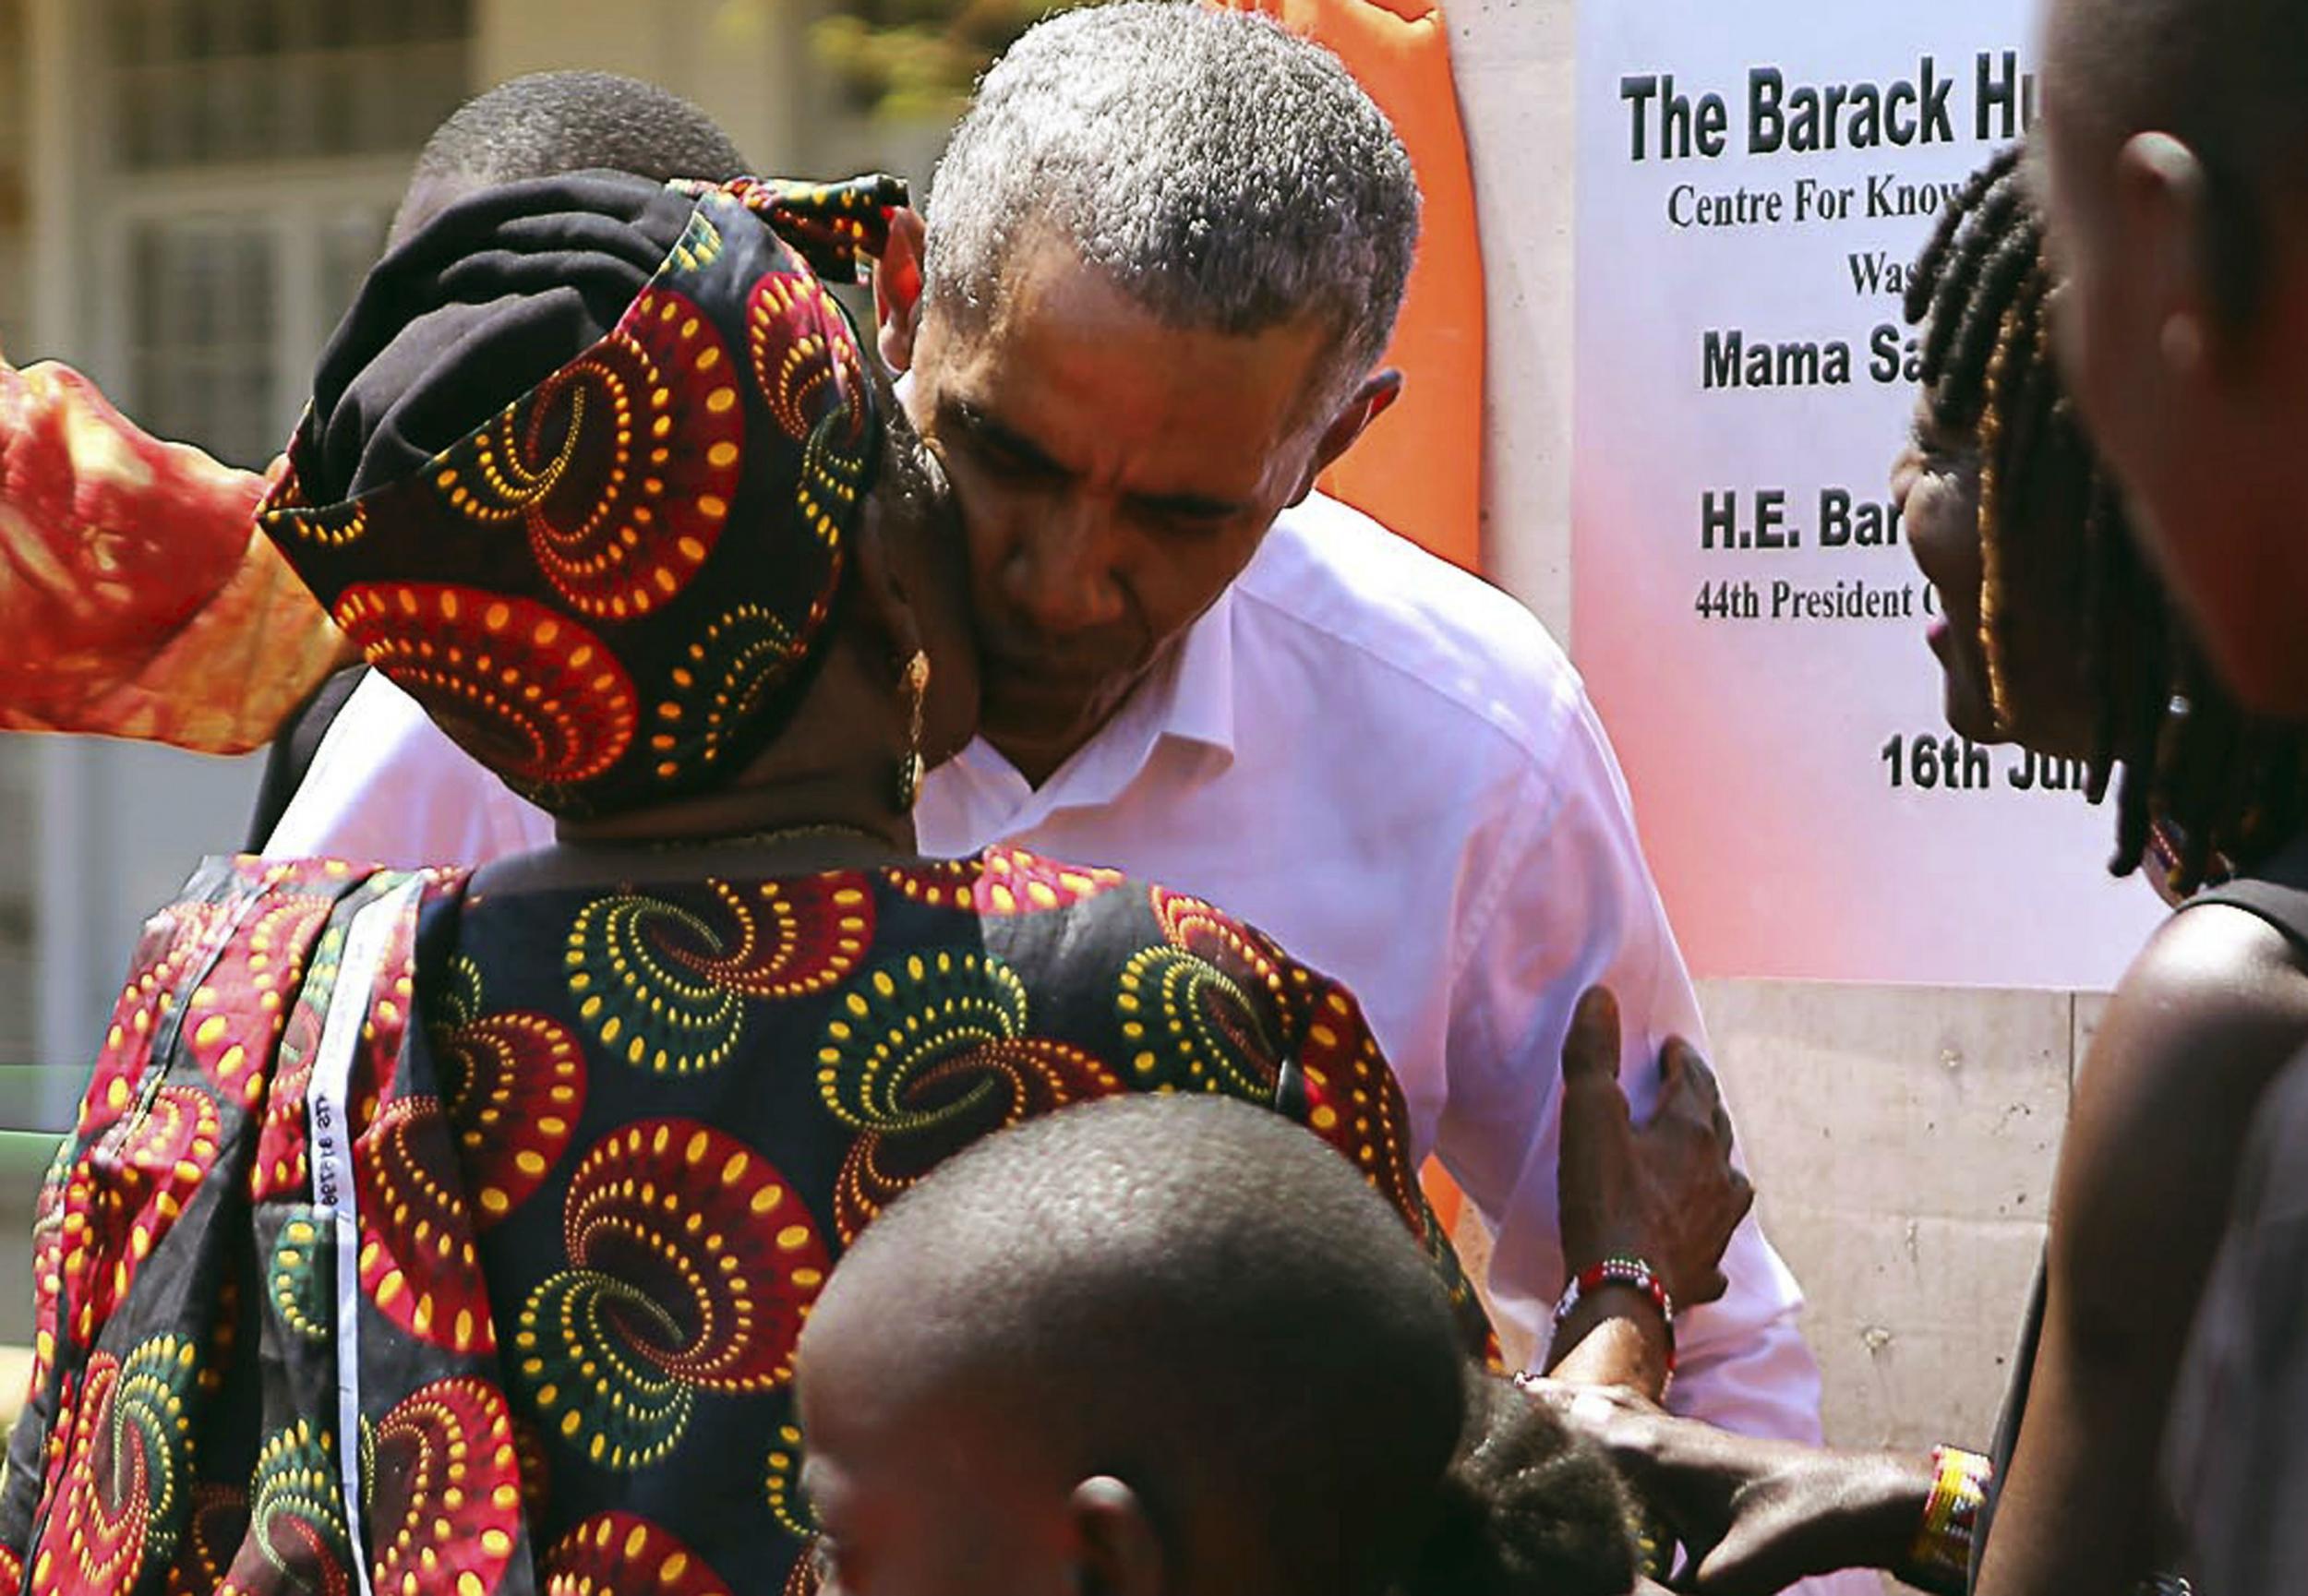 obama makes first visit to kenya since leaving office